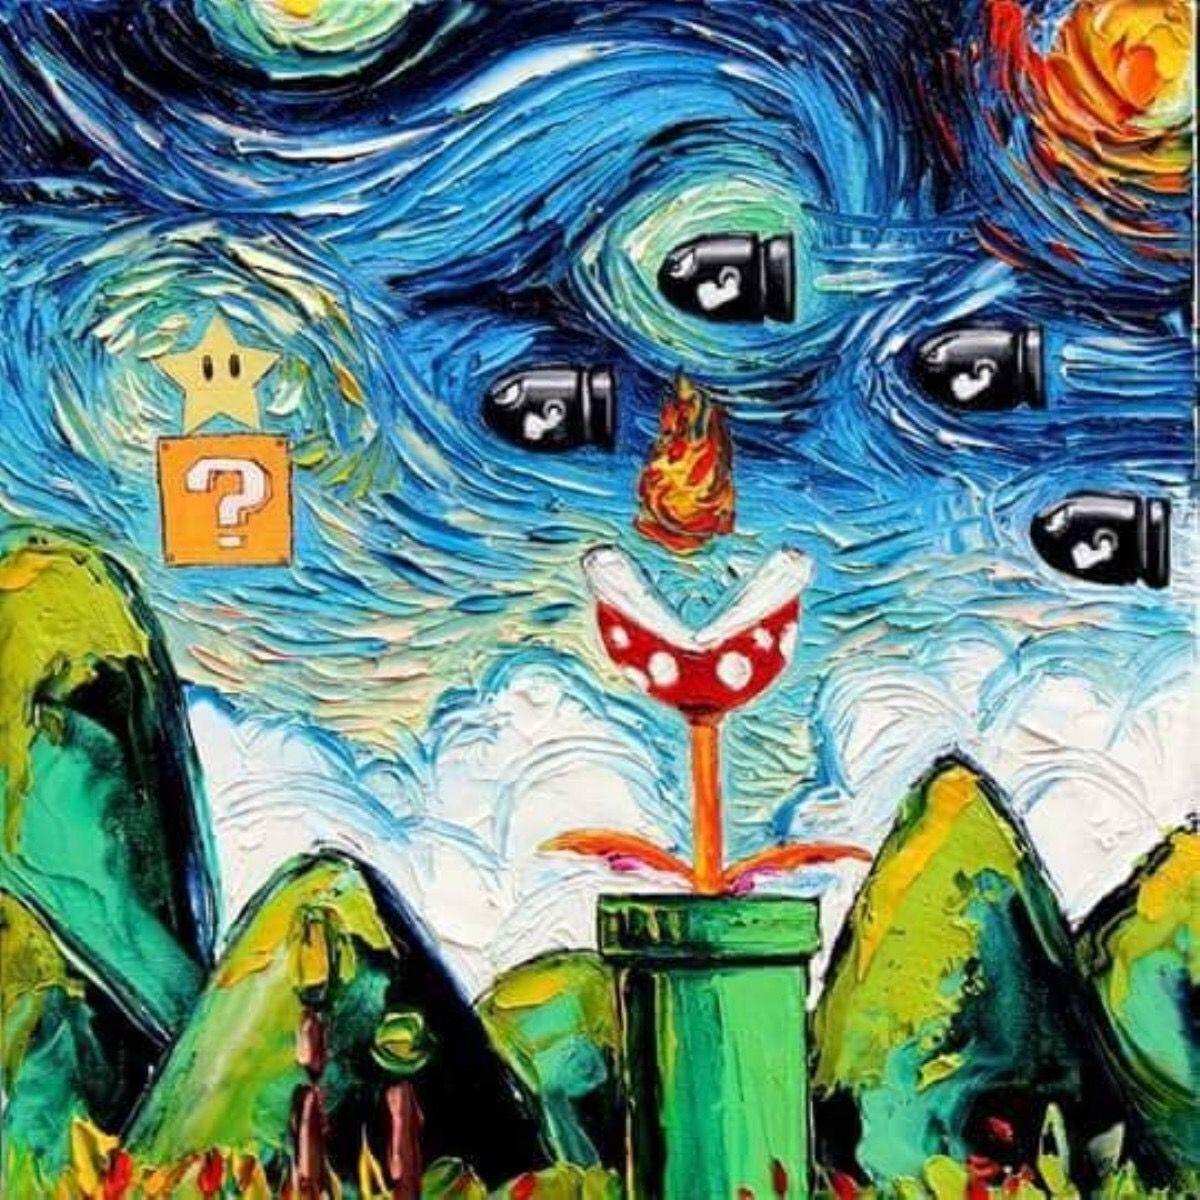 Mario mashup. Mario art, Video game art, Game art